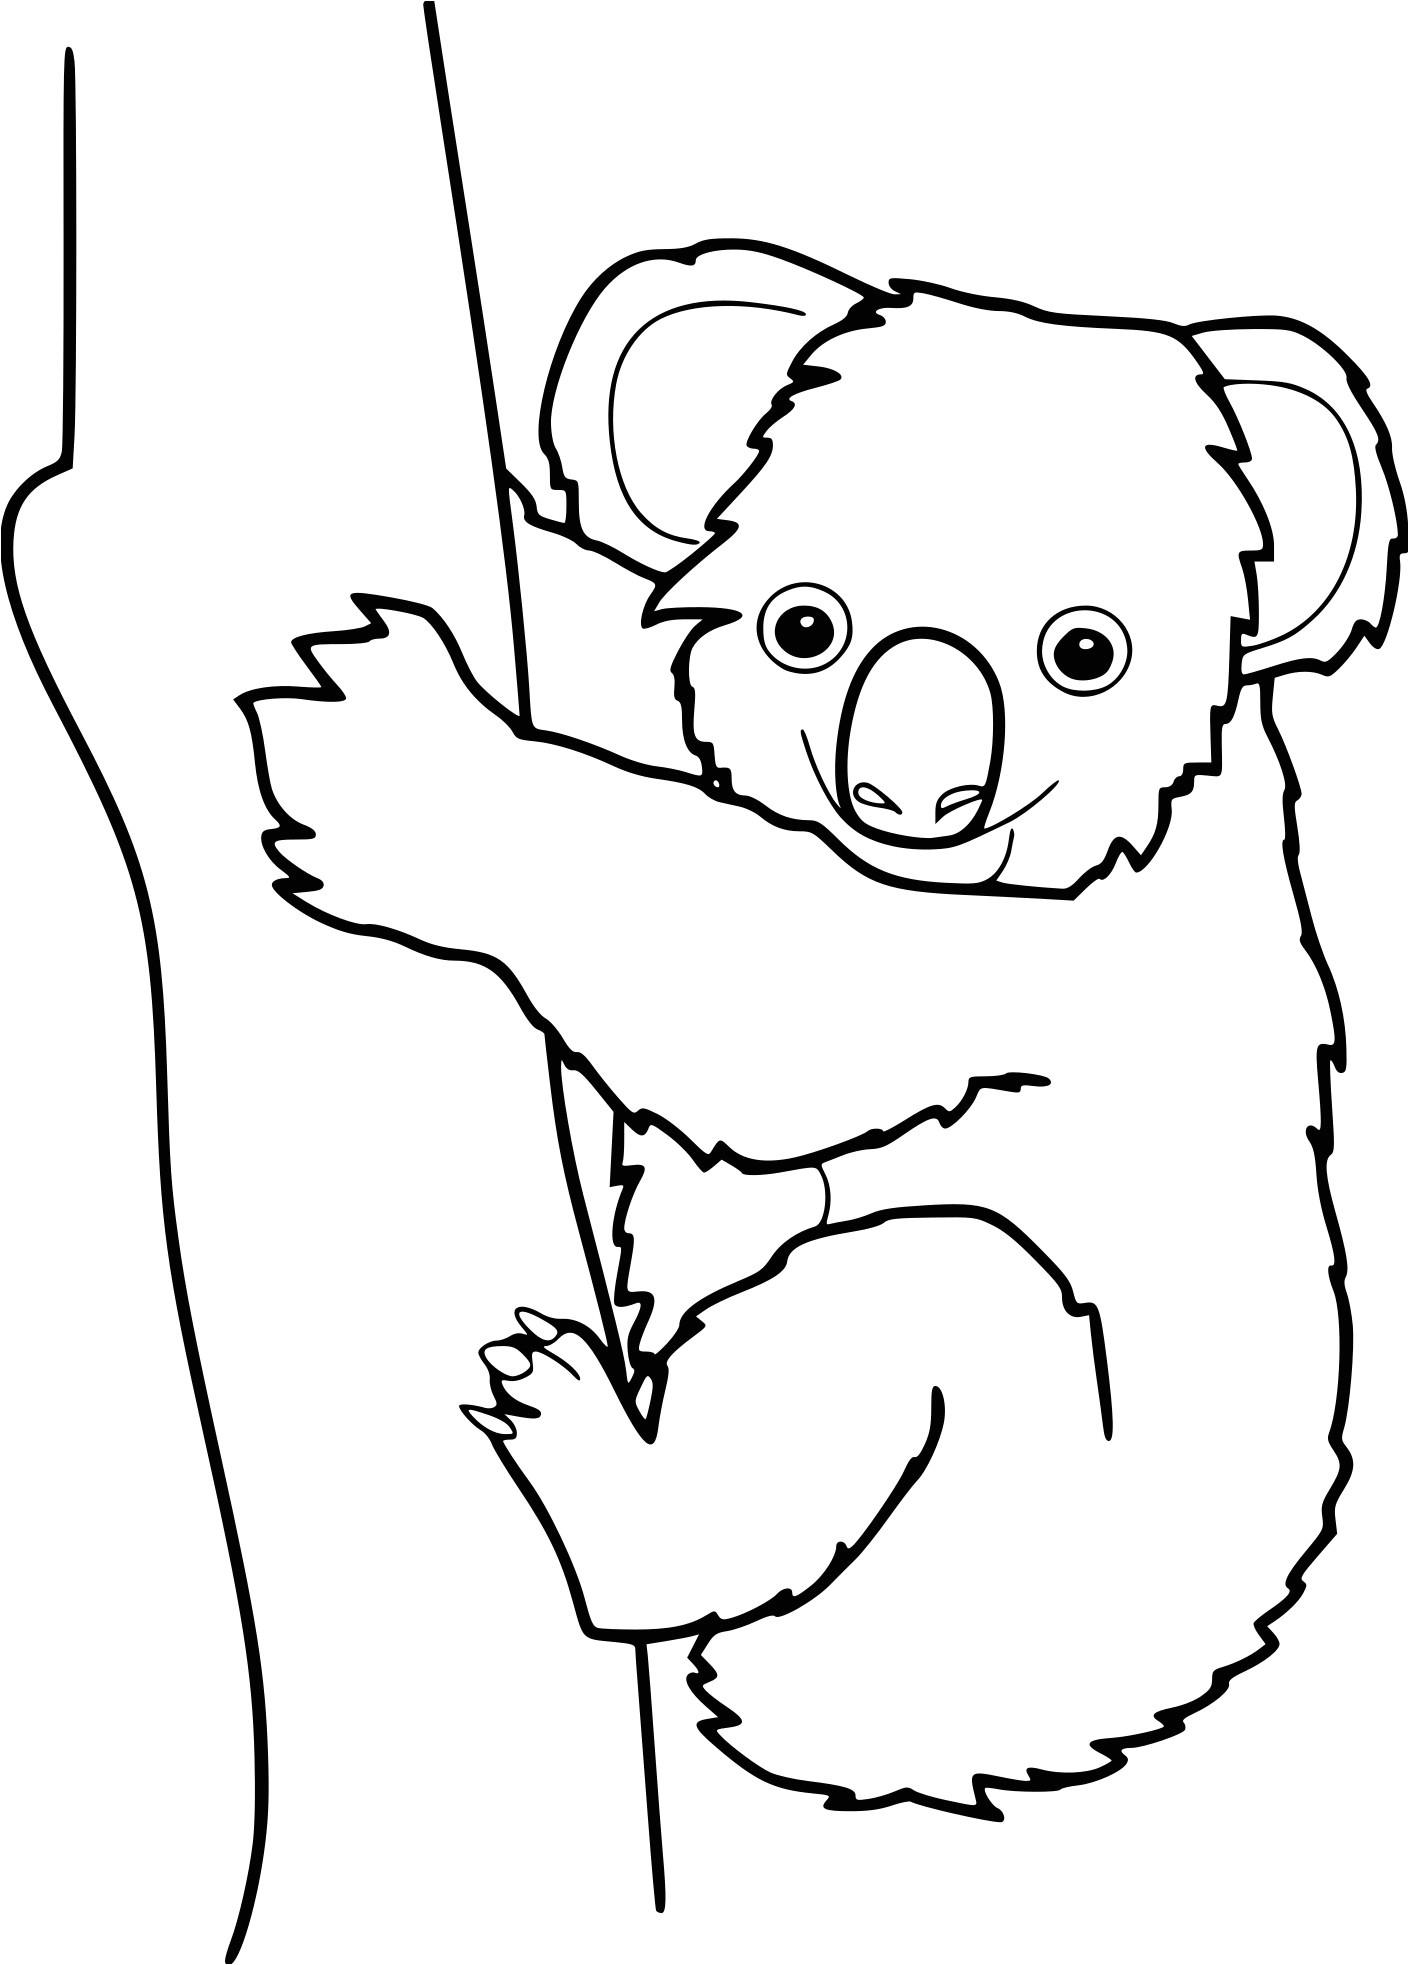 Coloriage A Imprimer Koala Coloriage Koala À Imprimer avec Coloriage Koala A Imprimer